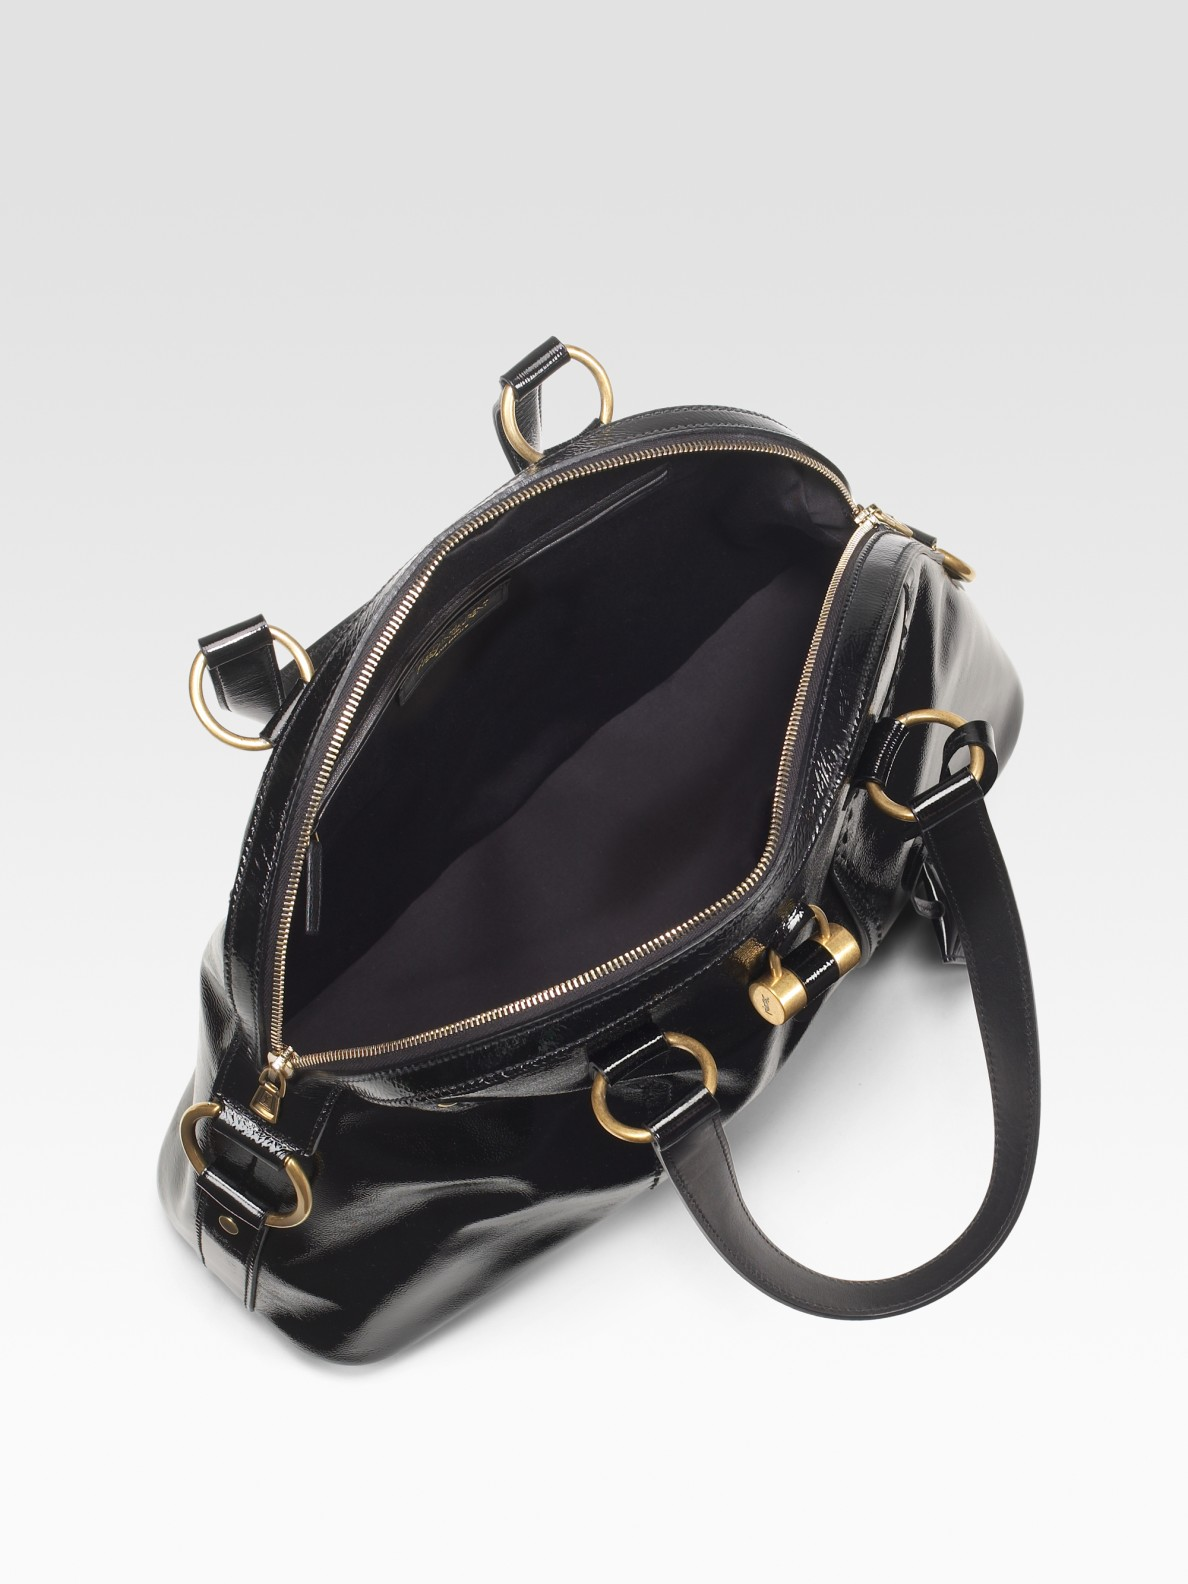 Saint laurent Patent Leather Muse Bag in Black | Lyst